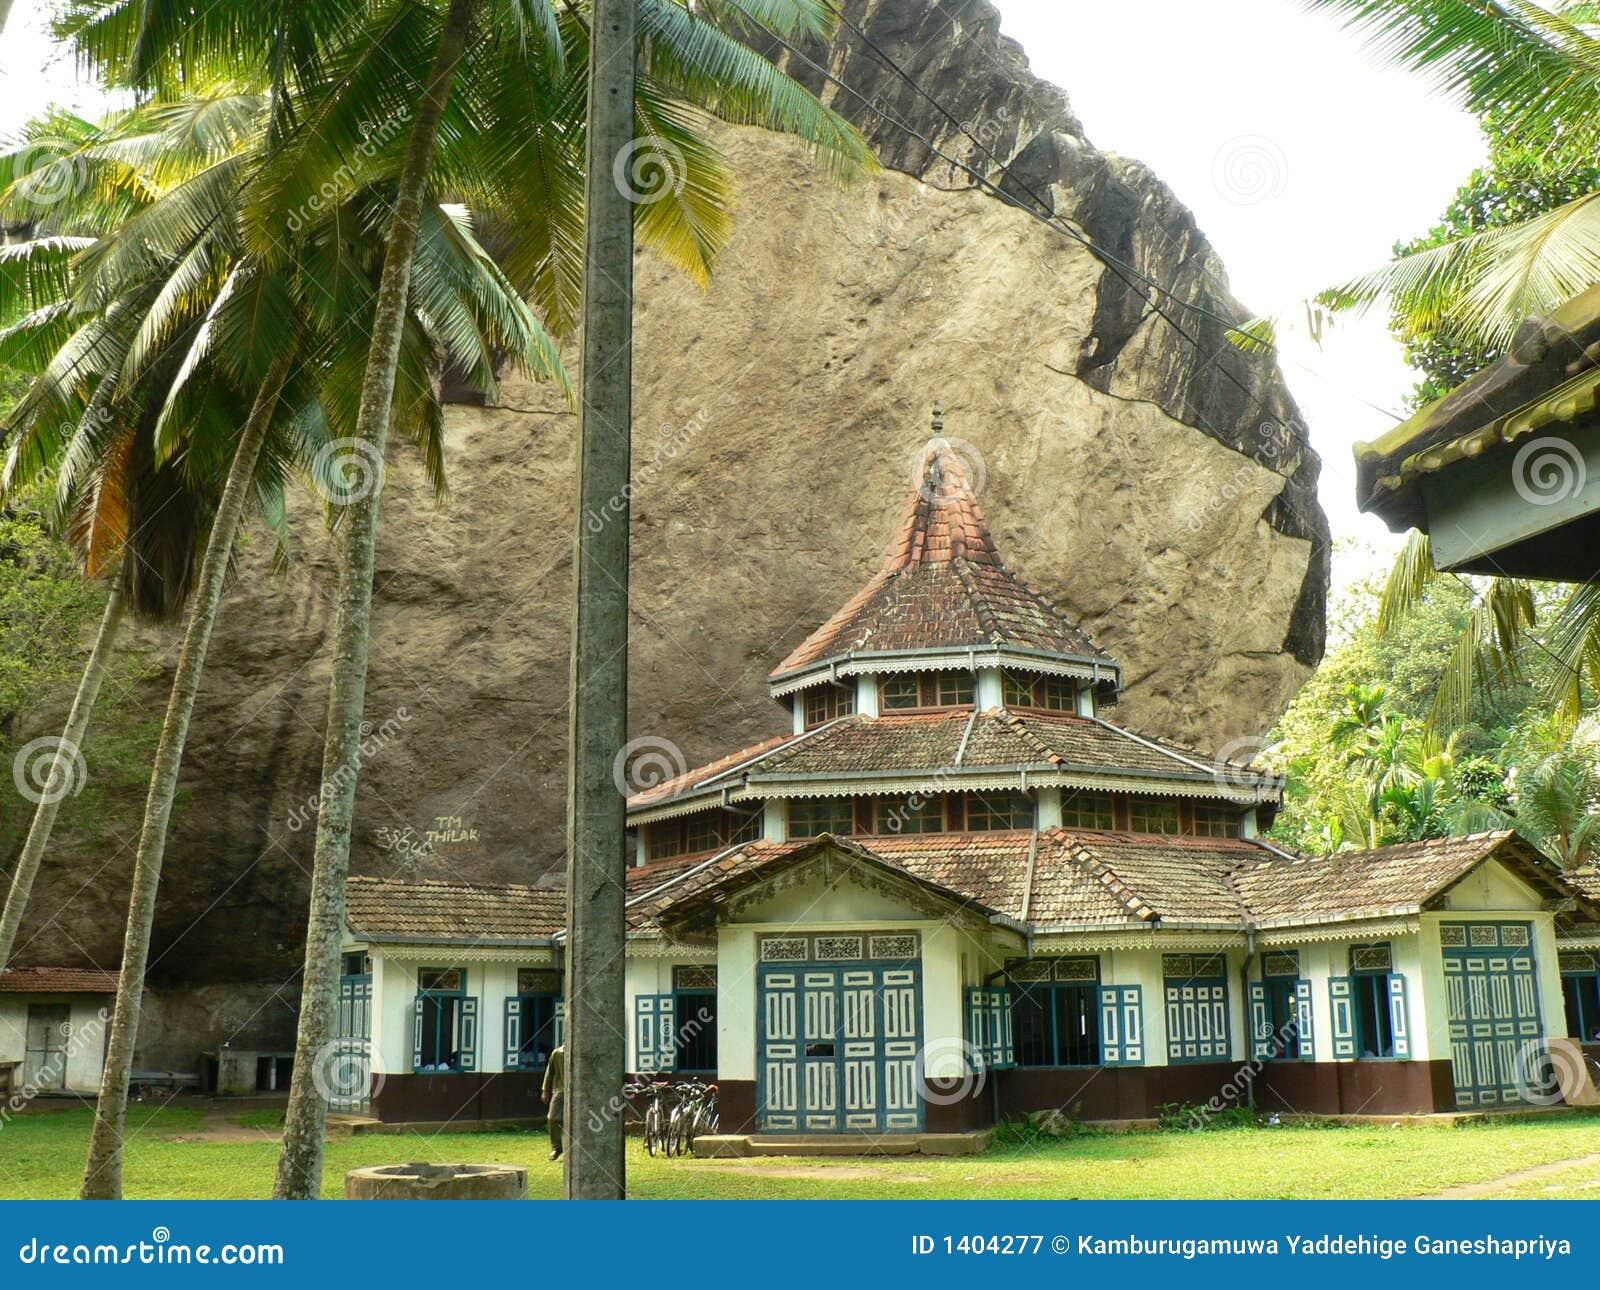 ancient architecture buddhist lanka old sri ...